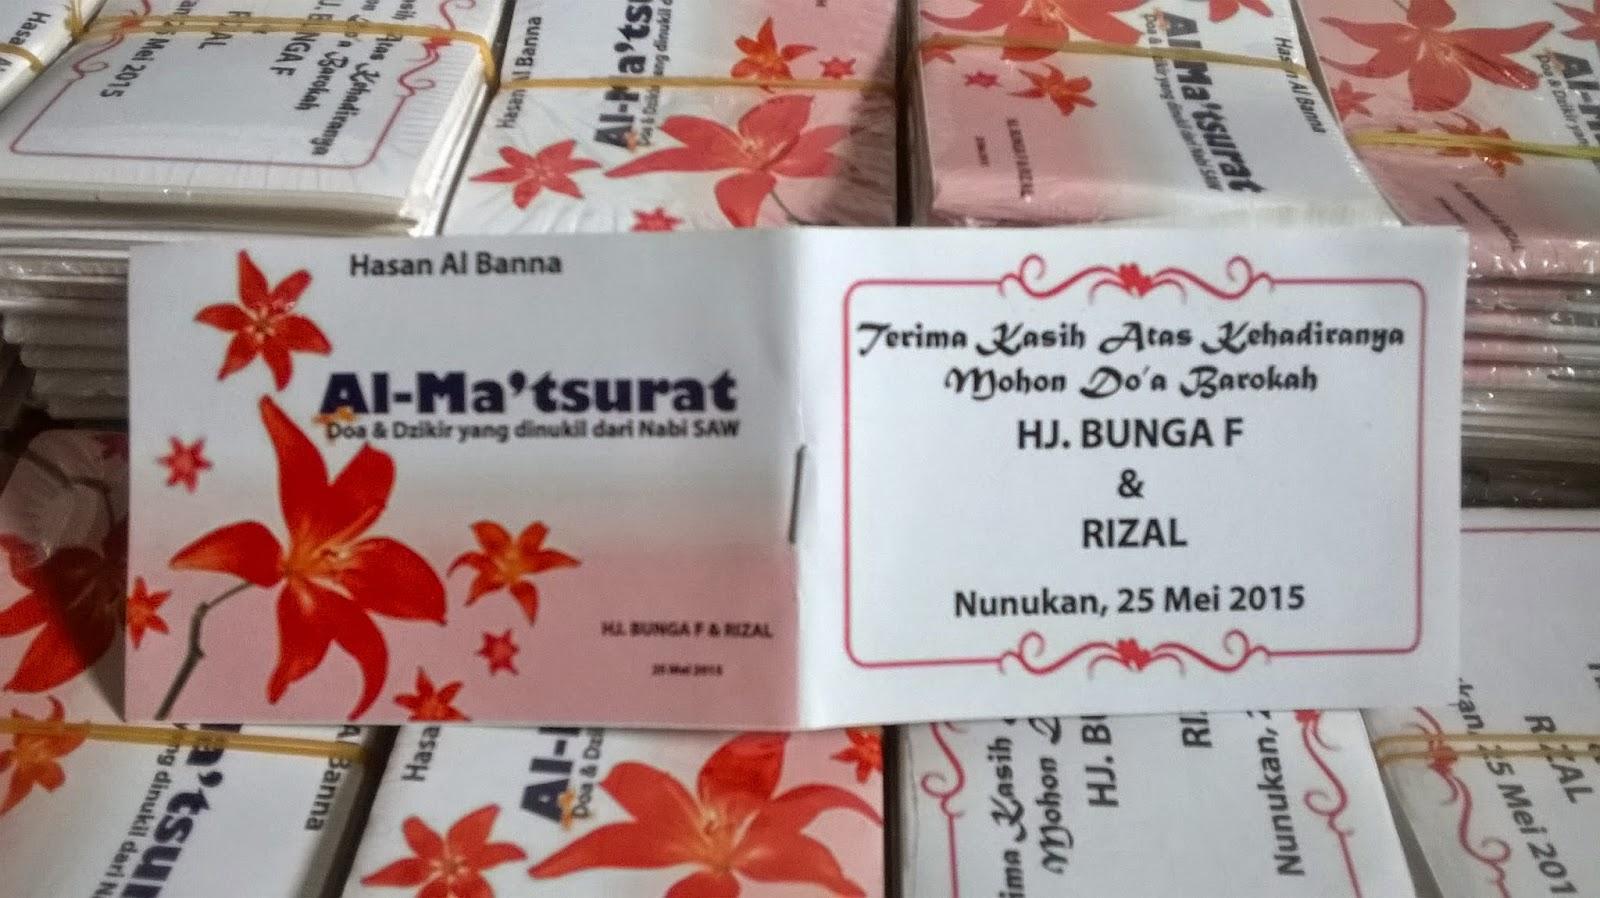 Al-Matsurat Suvenir Pernikahan